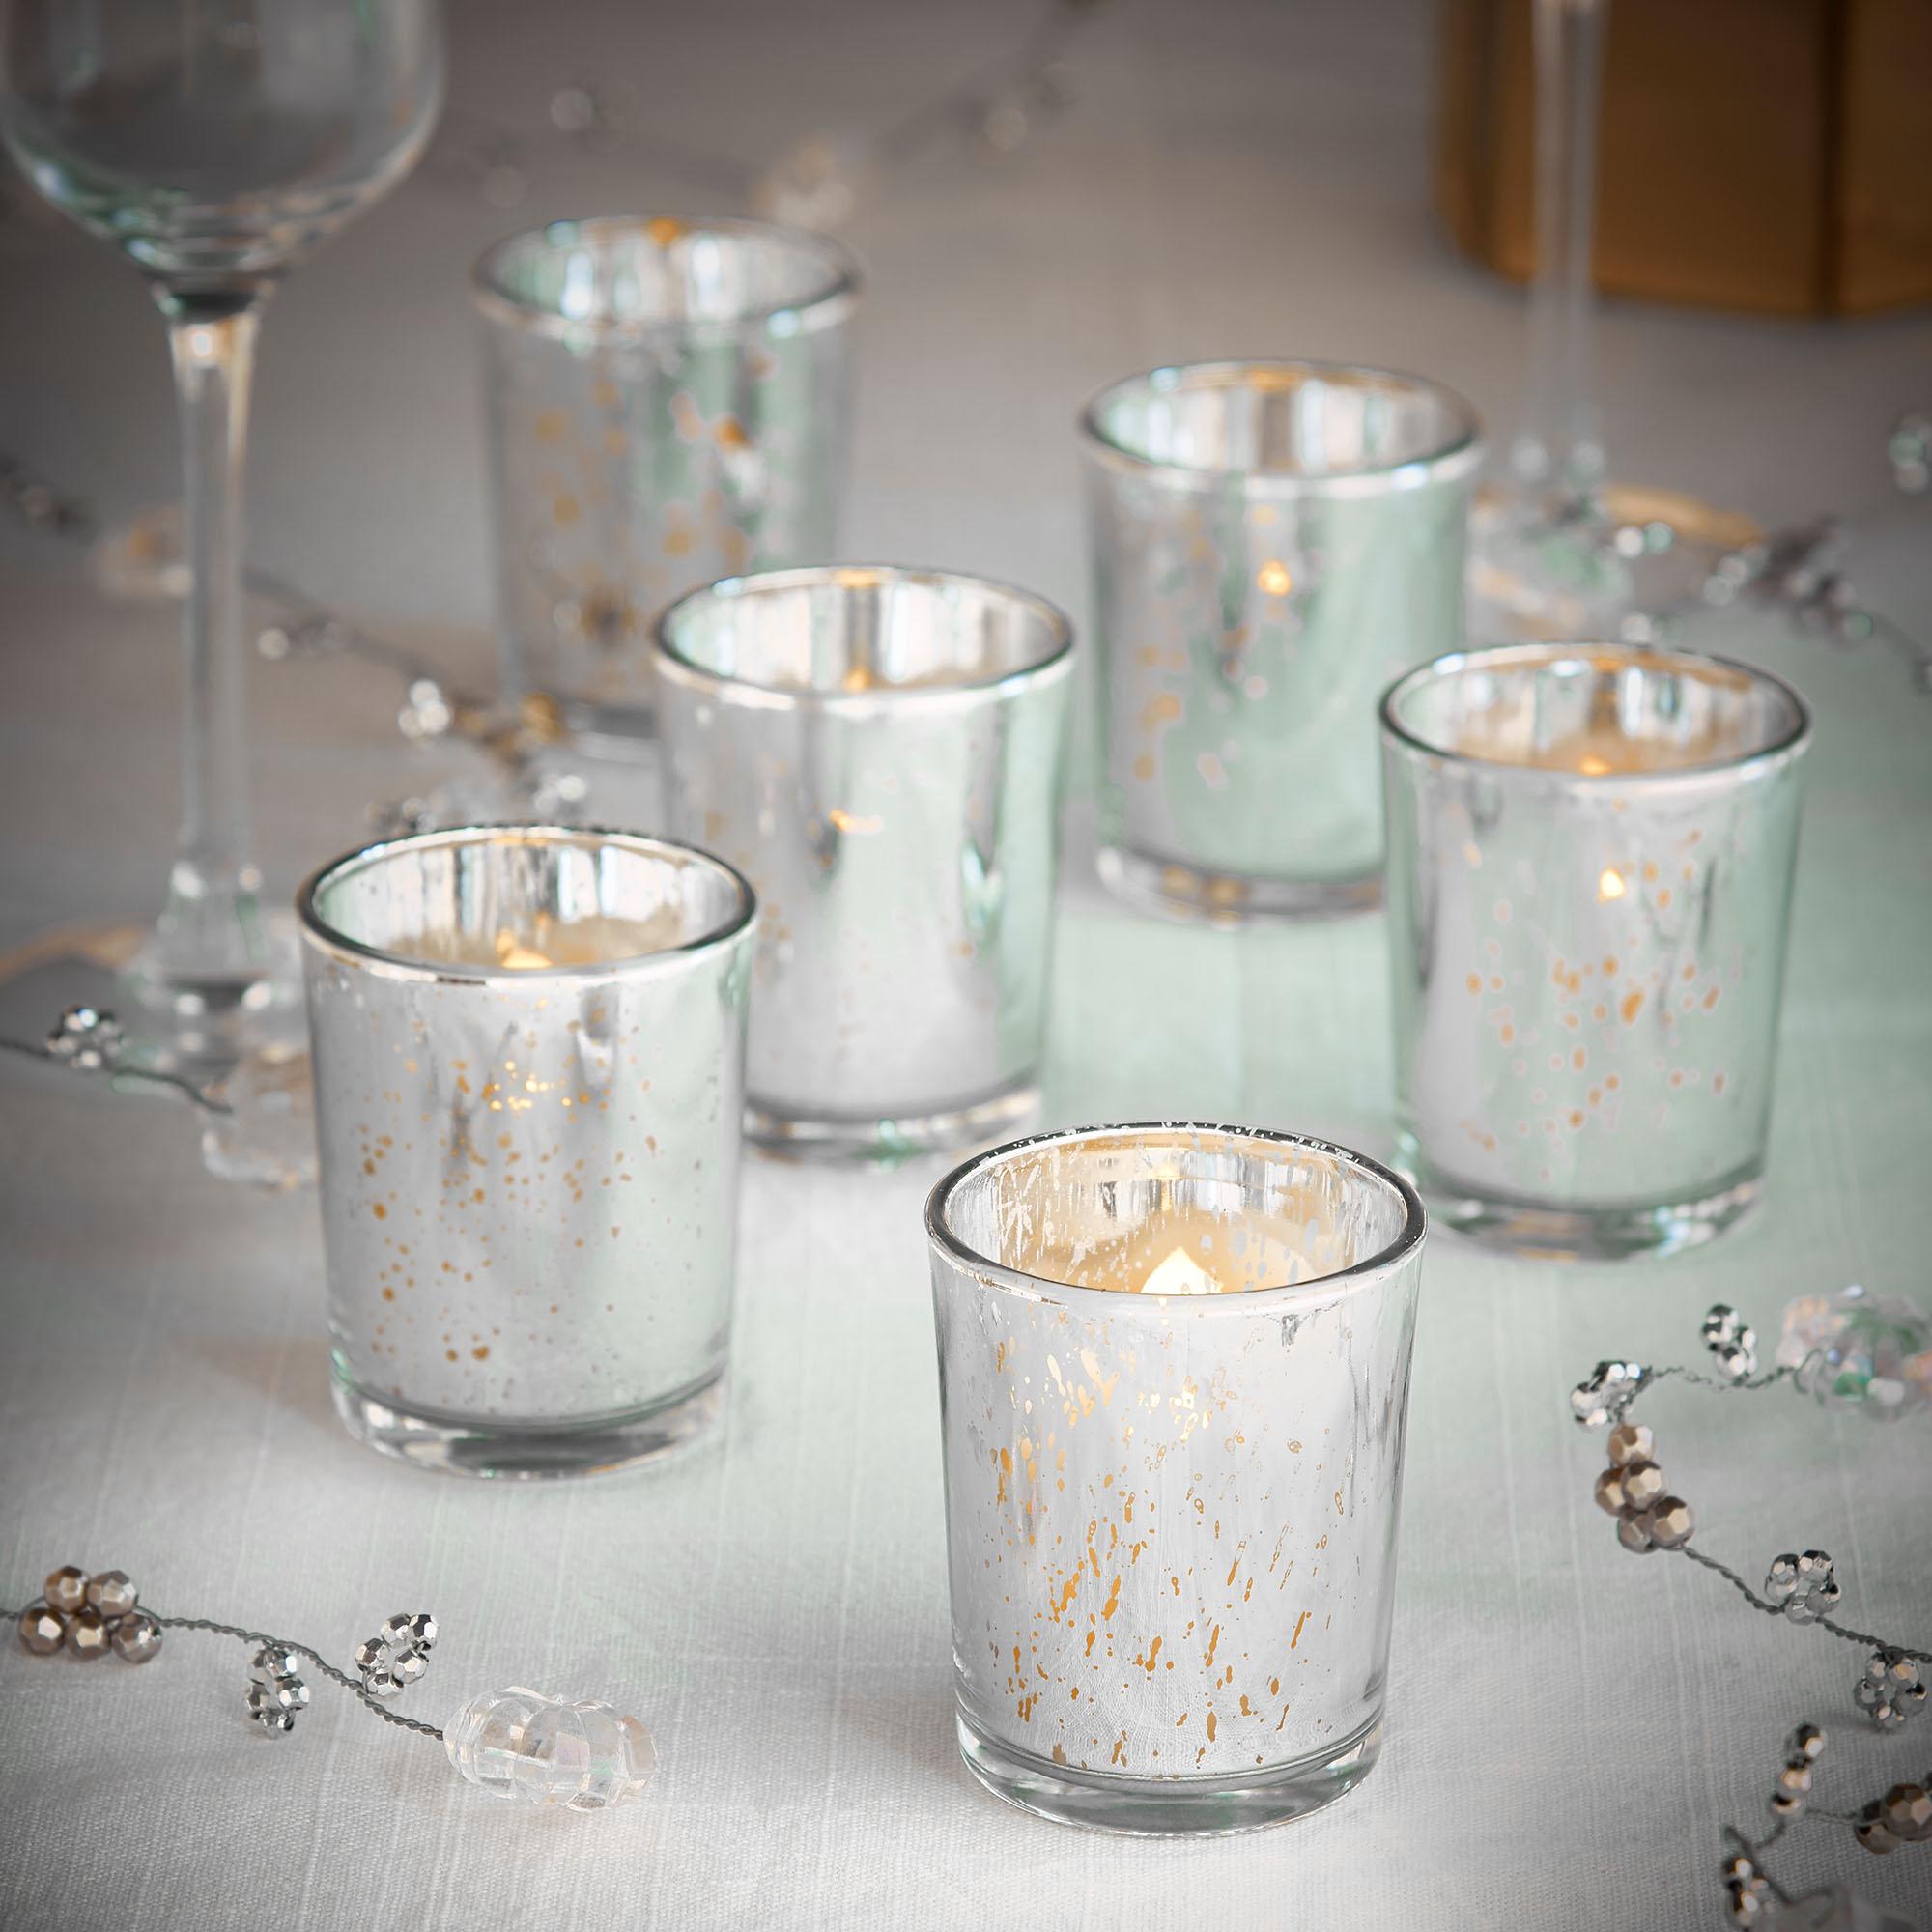 Vonhaus Flameless Vintage Led Battery Tea Light Candles